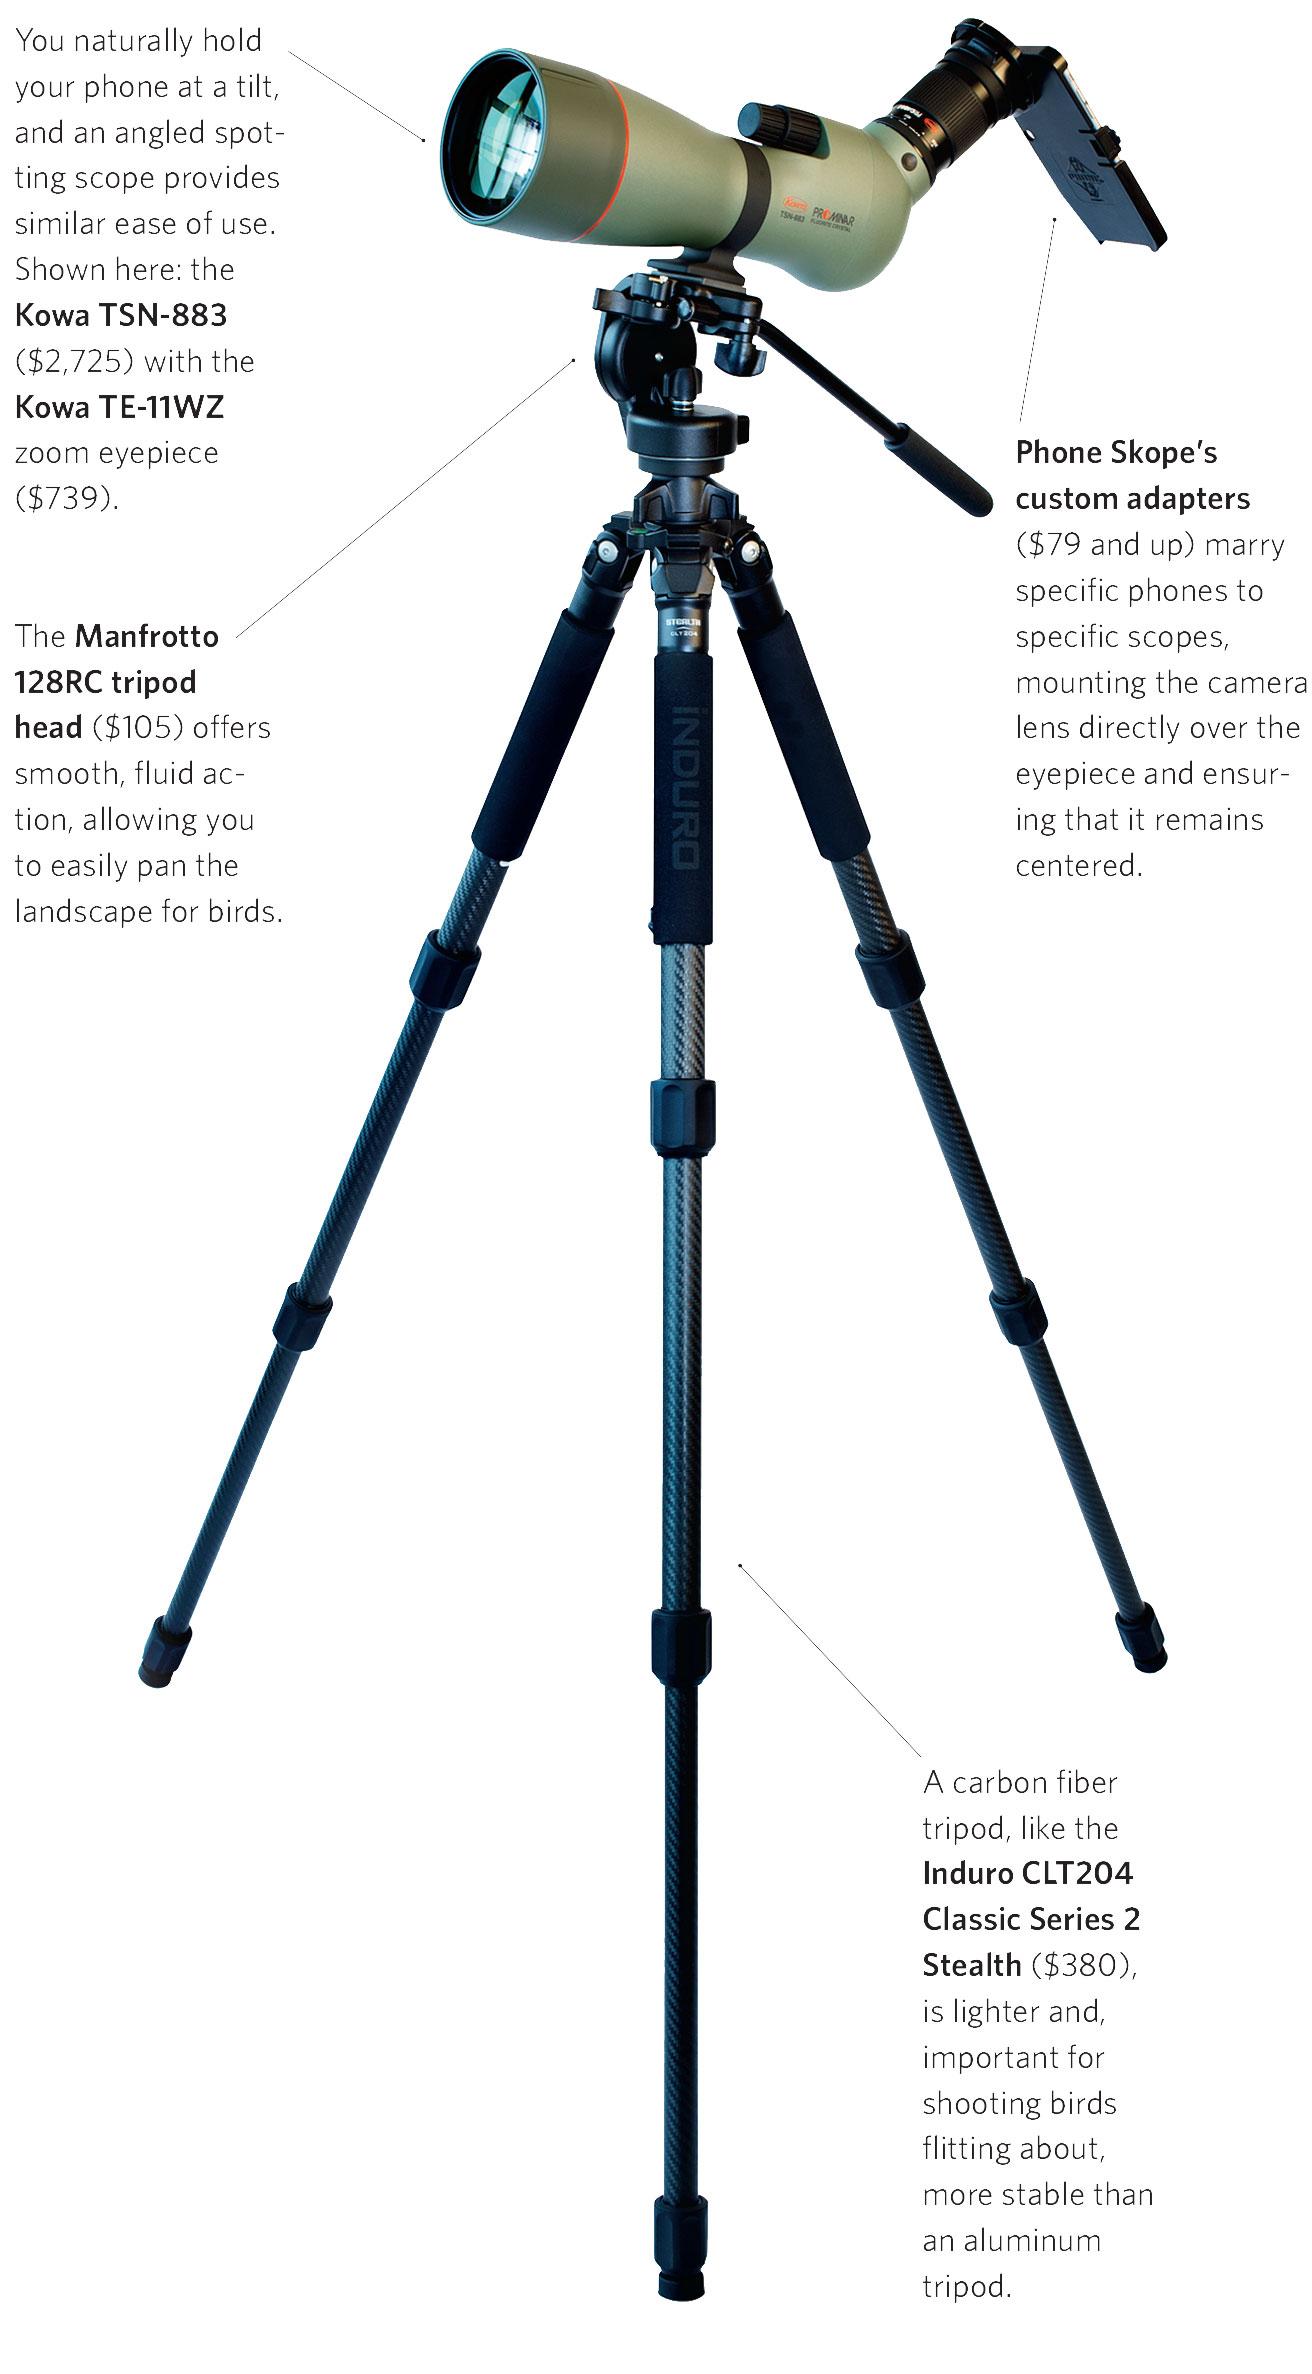 Clockwise from top left: Kowa TSN-883 scope, Kowa TE-11WZ zoom eyepiece, Phone Skope adapter, Induro CLT204 tripod, and Manfrotto 128RC camera head. Mike Fernandez/Audubon